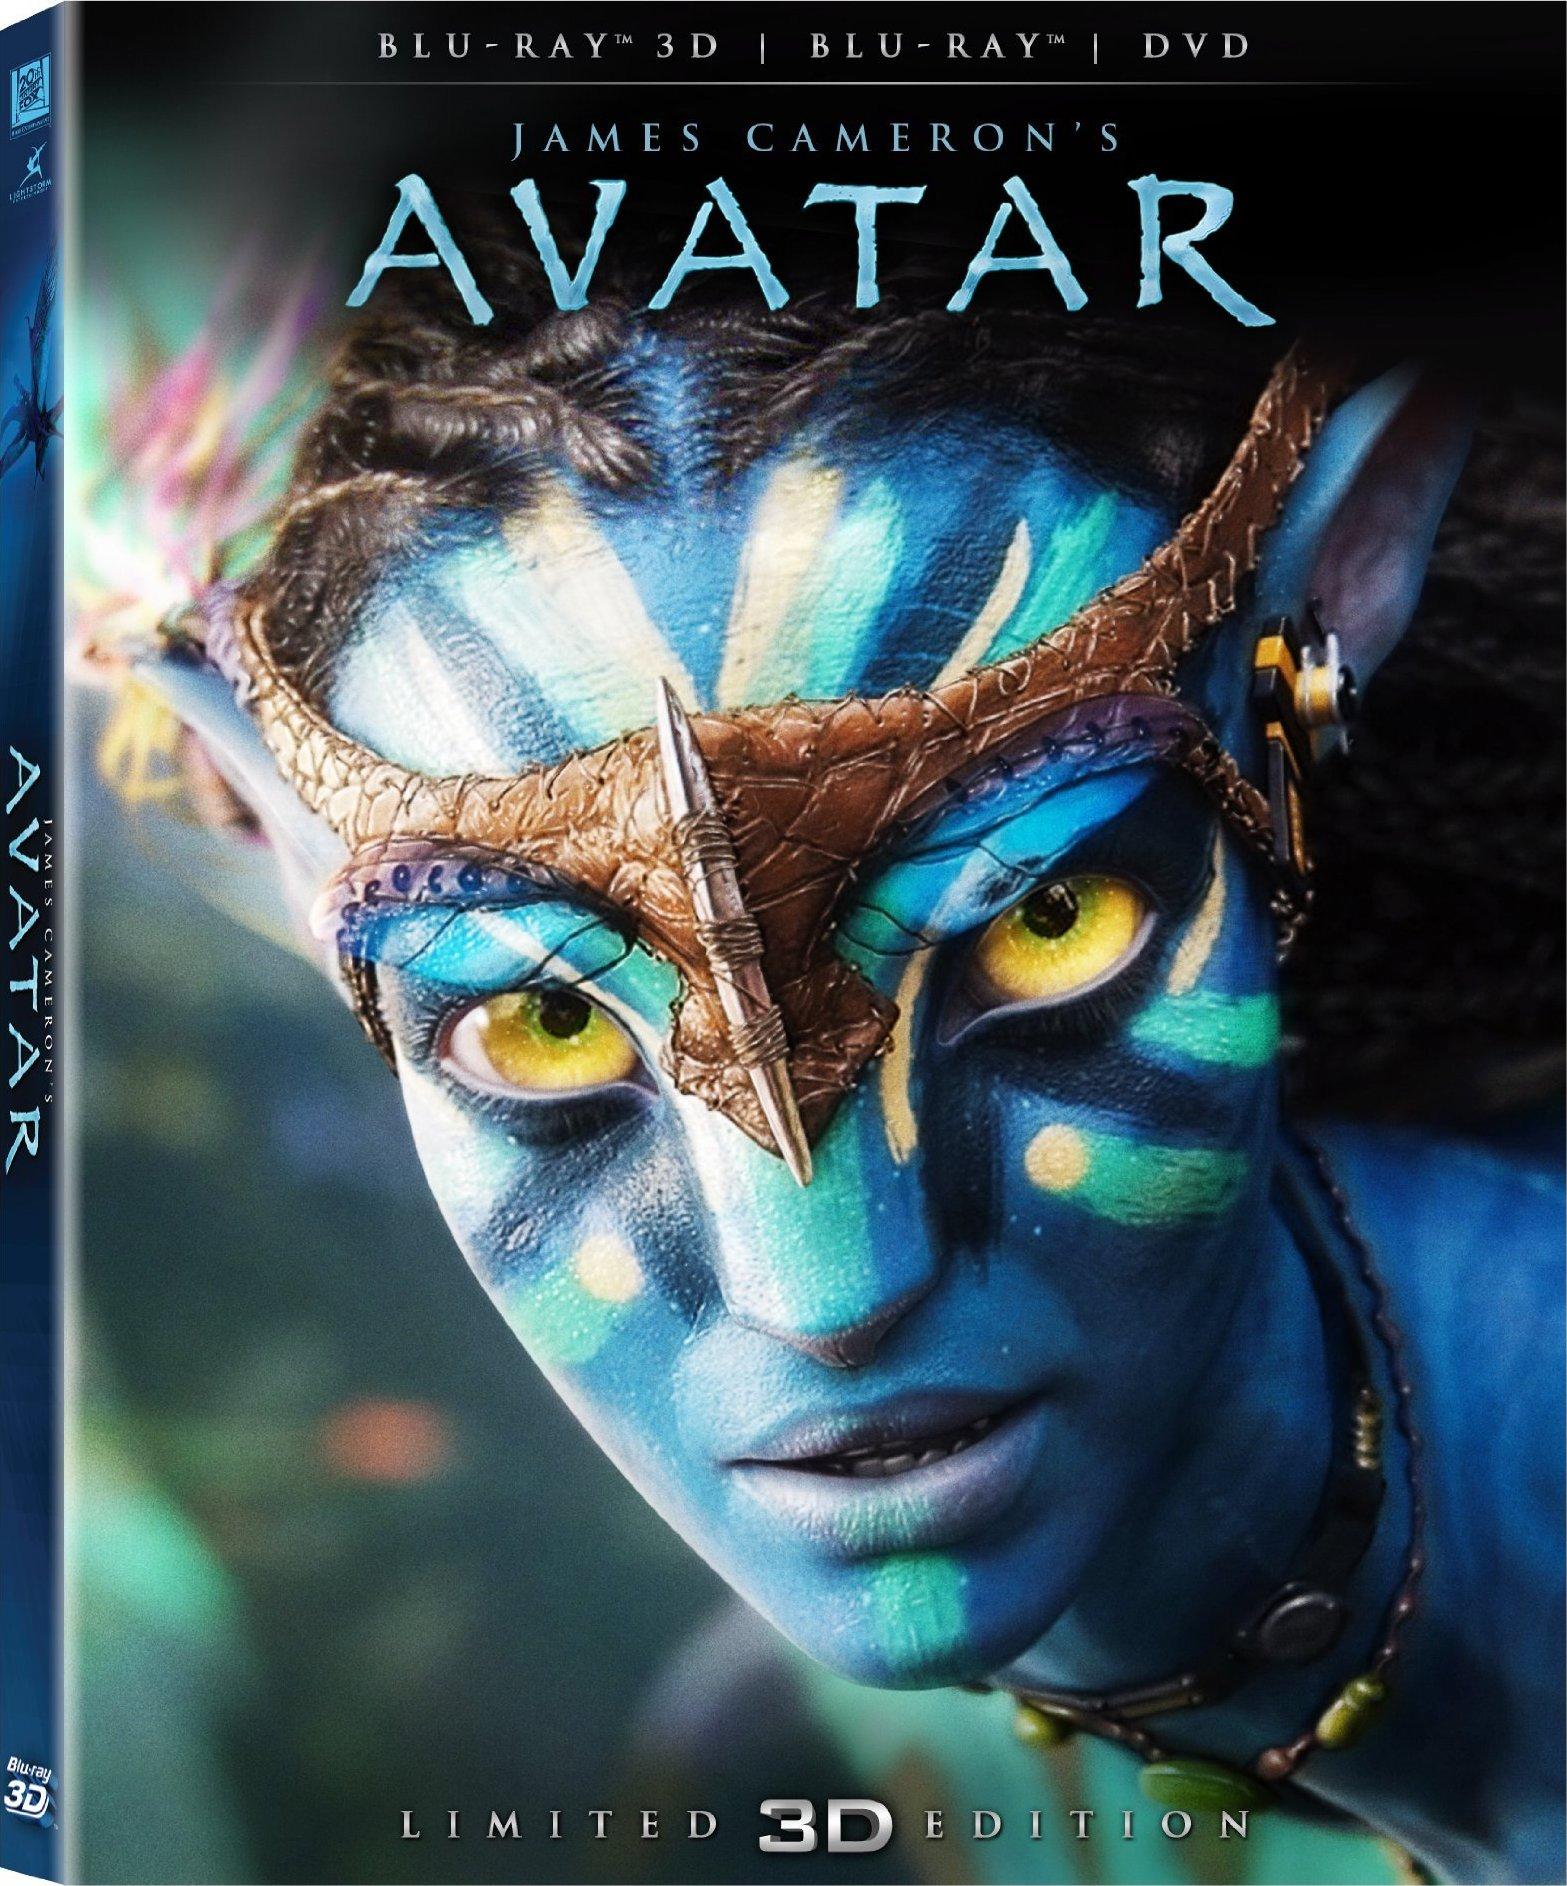 Avatar 2009 EXTENDED 1080p BluRay - مترجم -- Seeders: 4 -- Leechers: 0